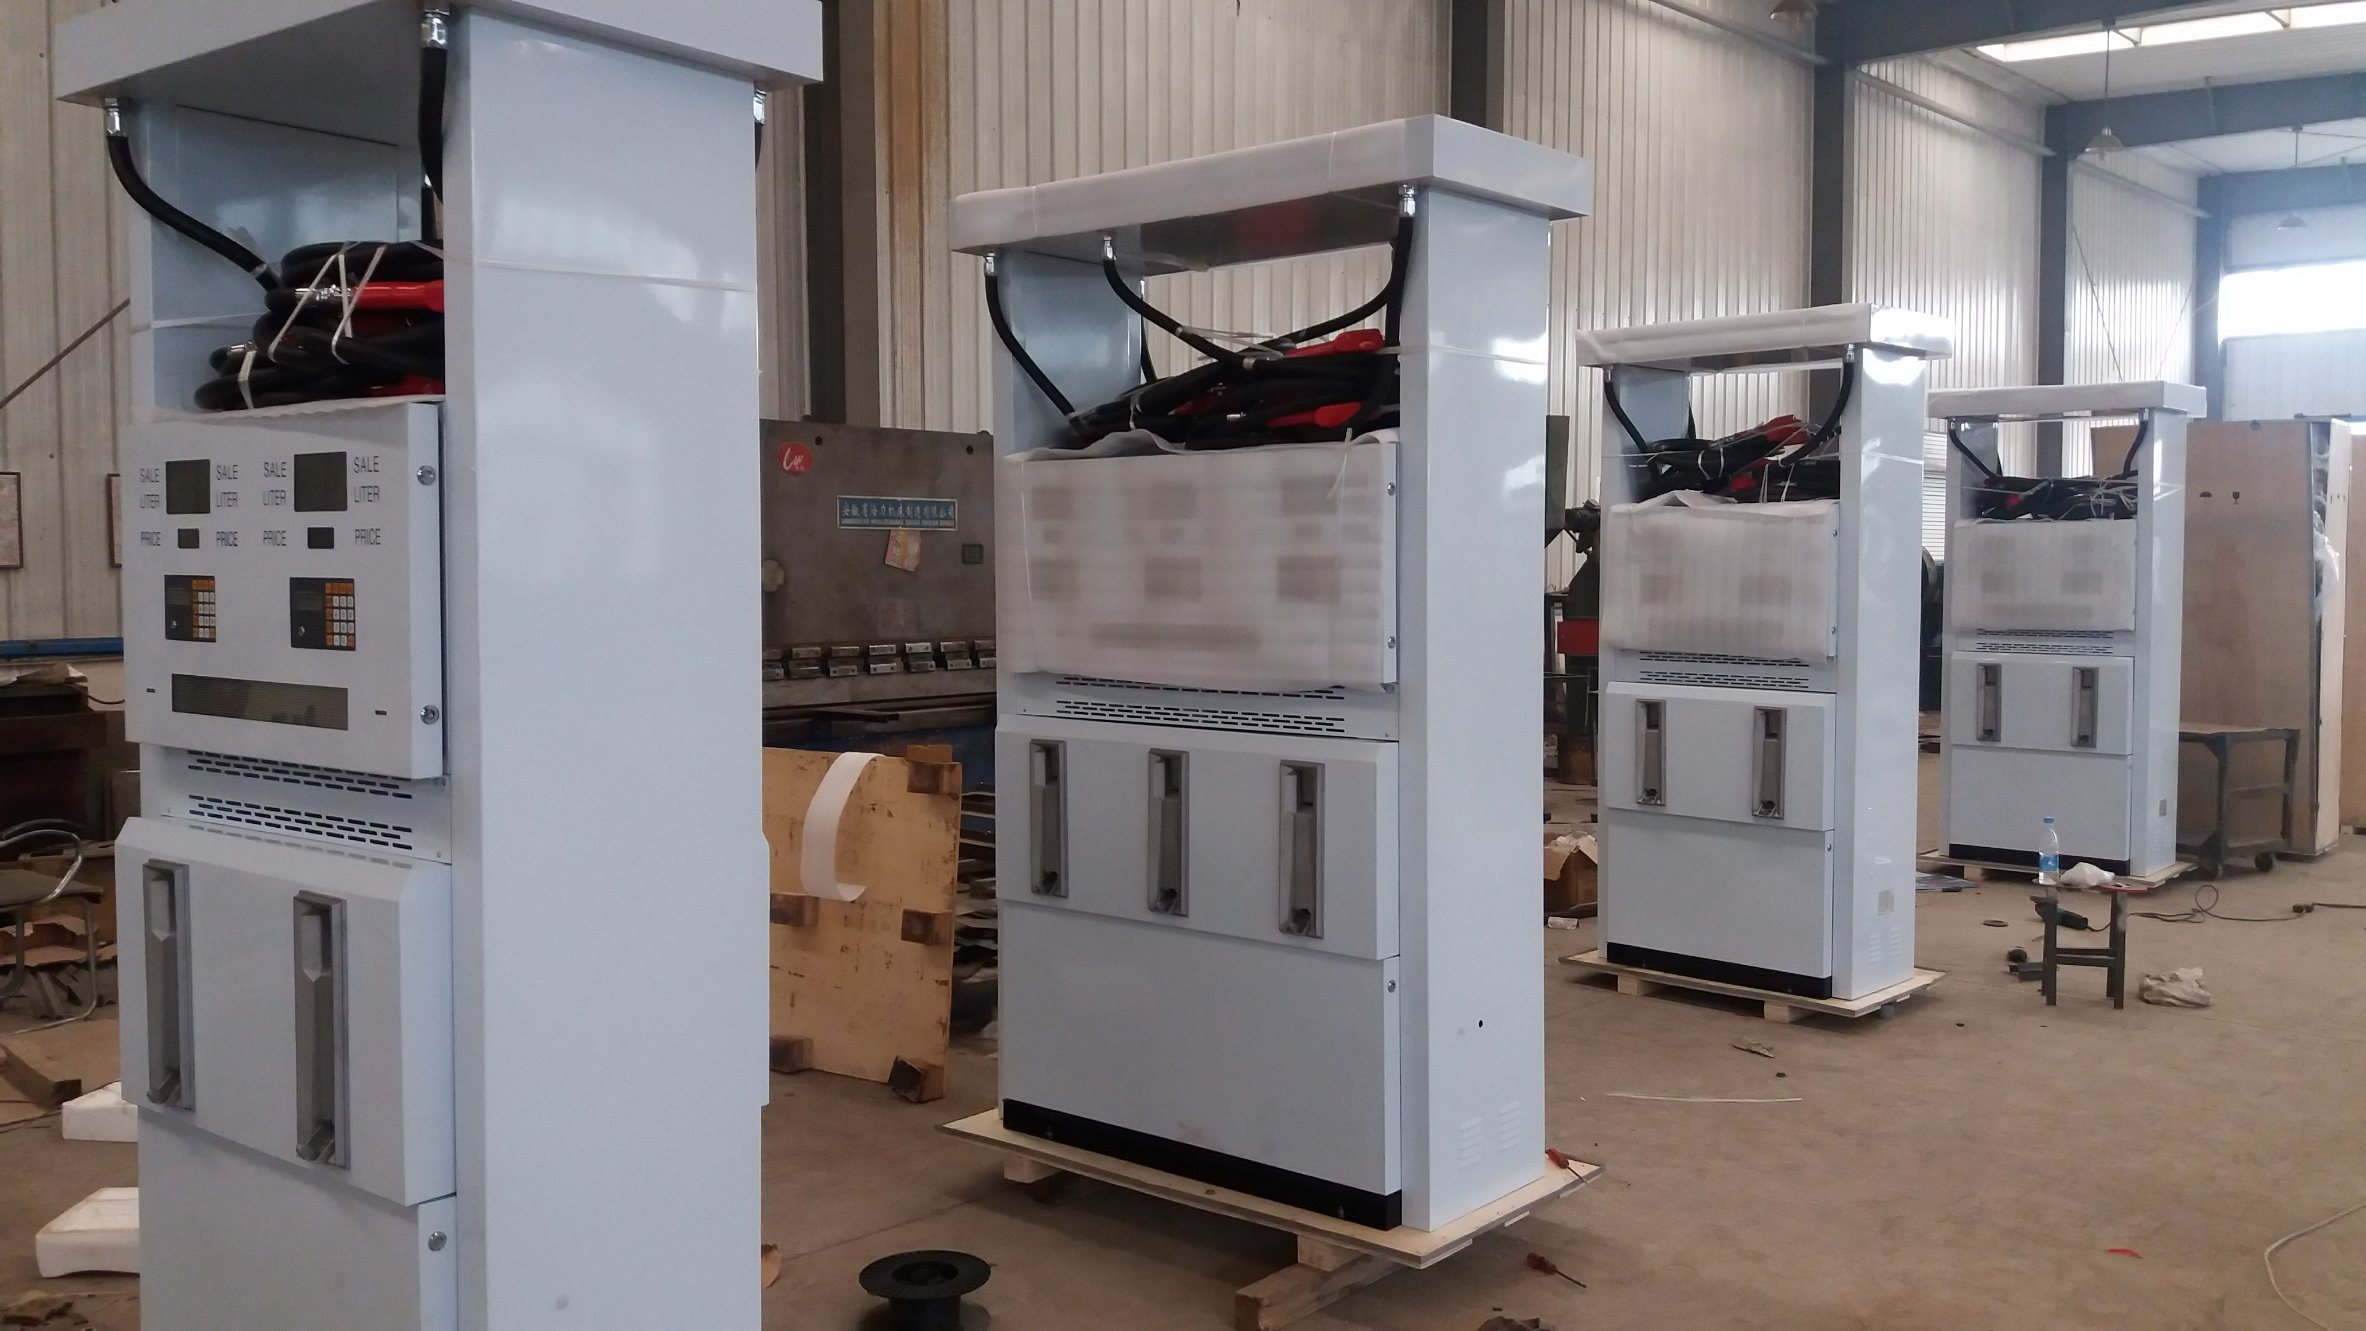 Fuel Dispenser Used for Oil Station for Sales